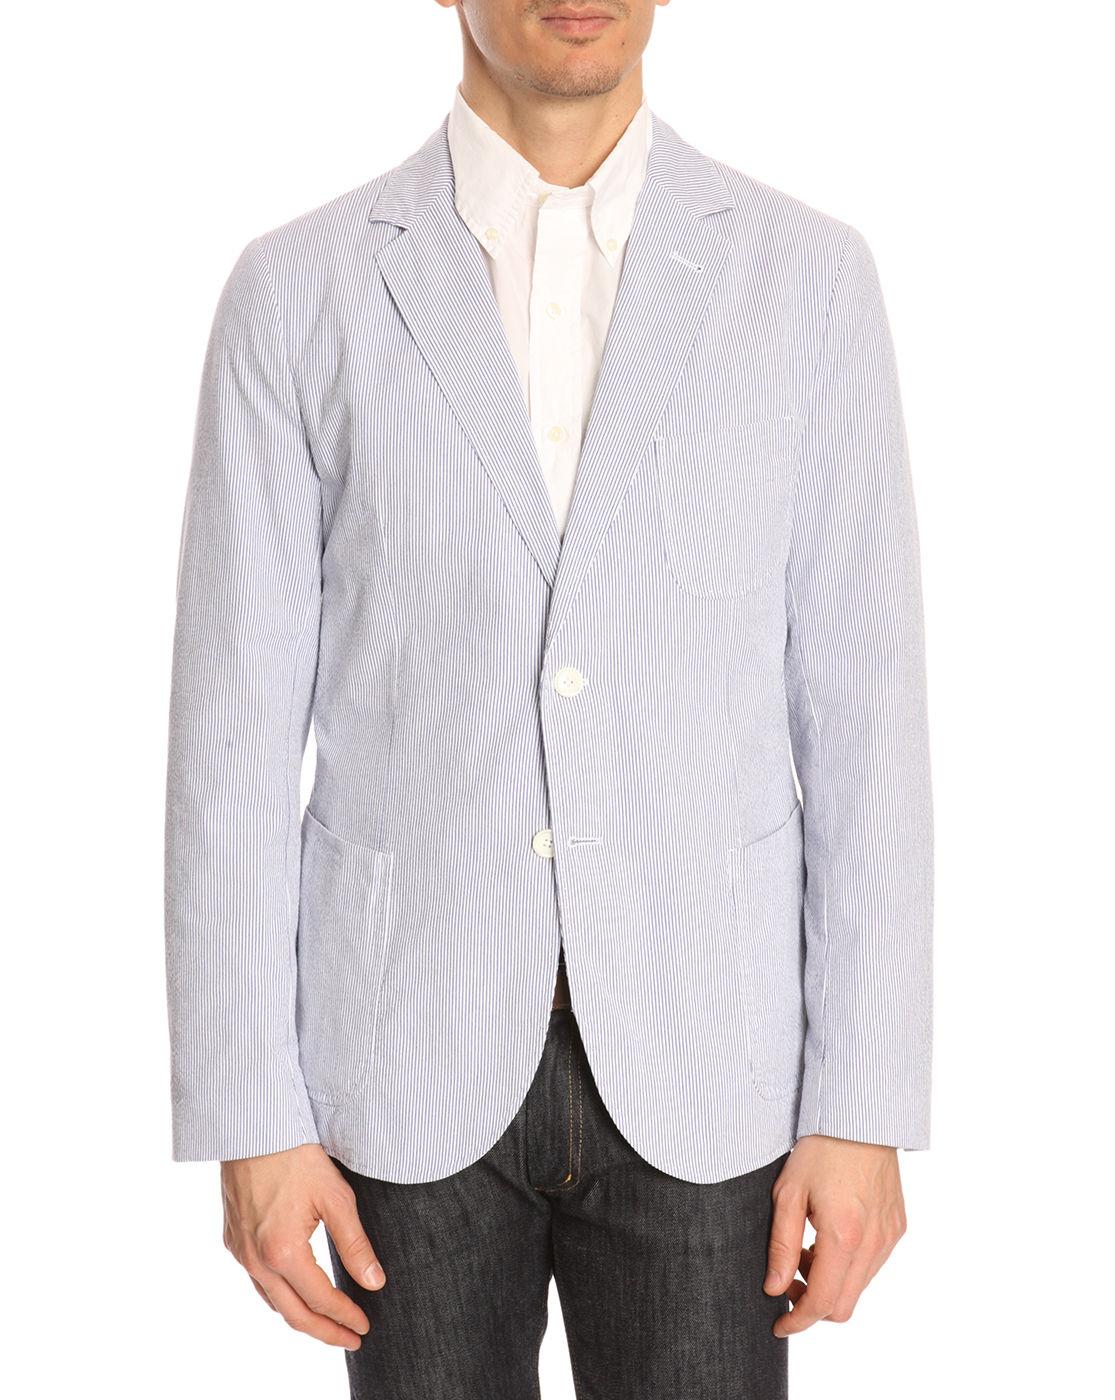 Find great deals on eBay for seersucker jacket. Shop with confidence.